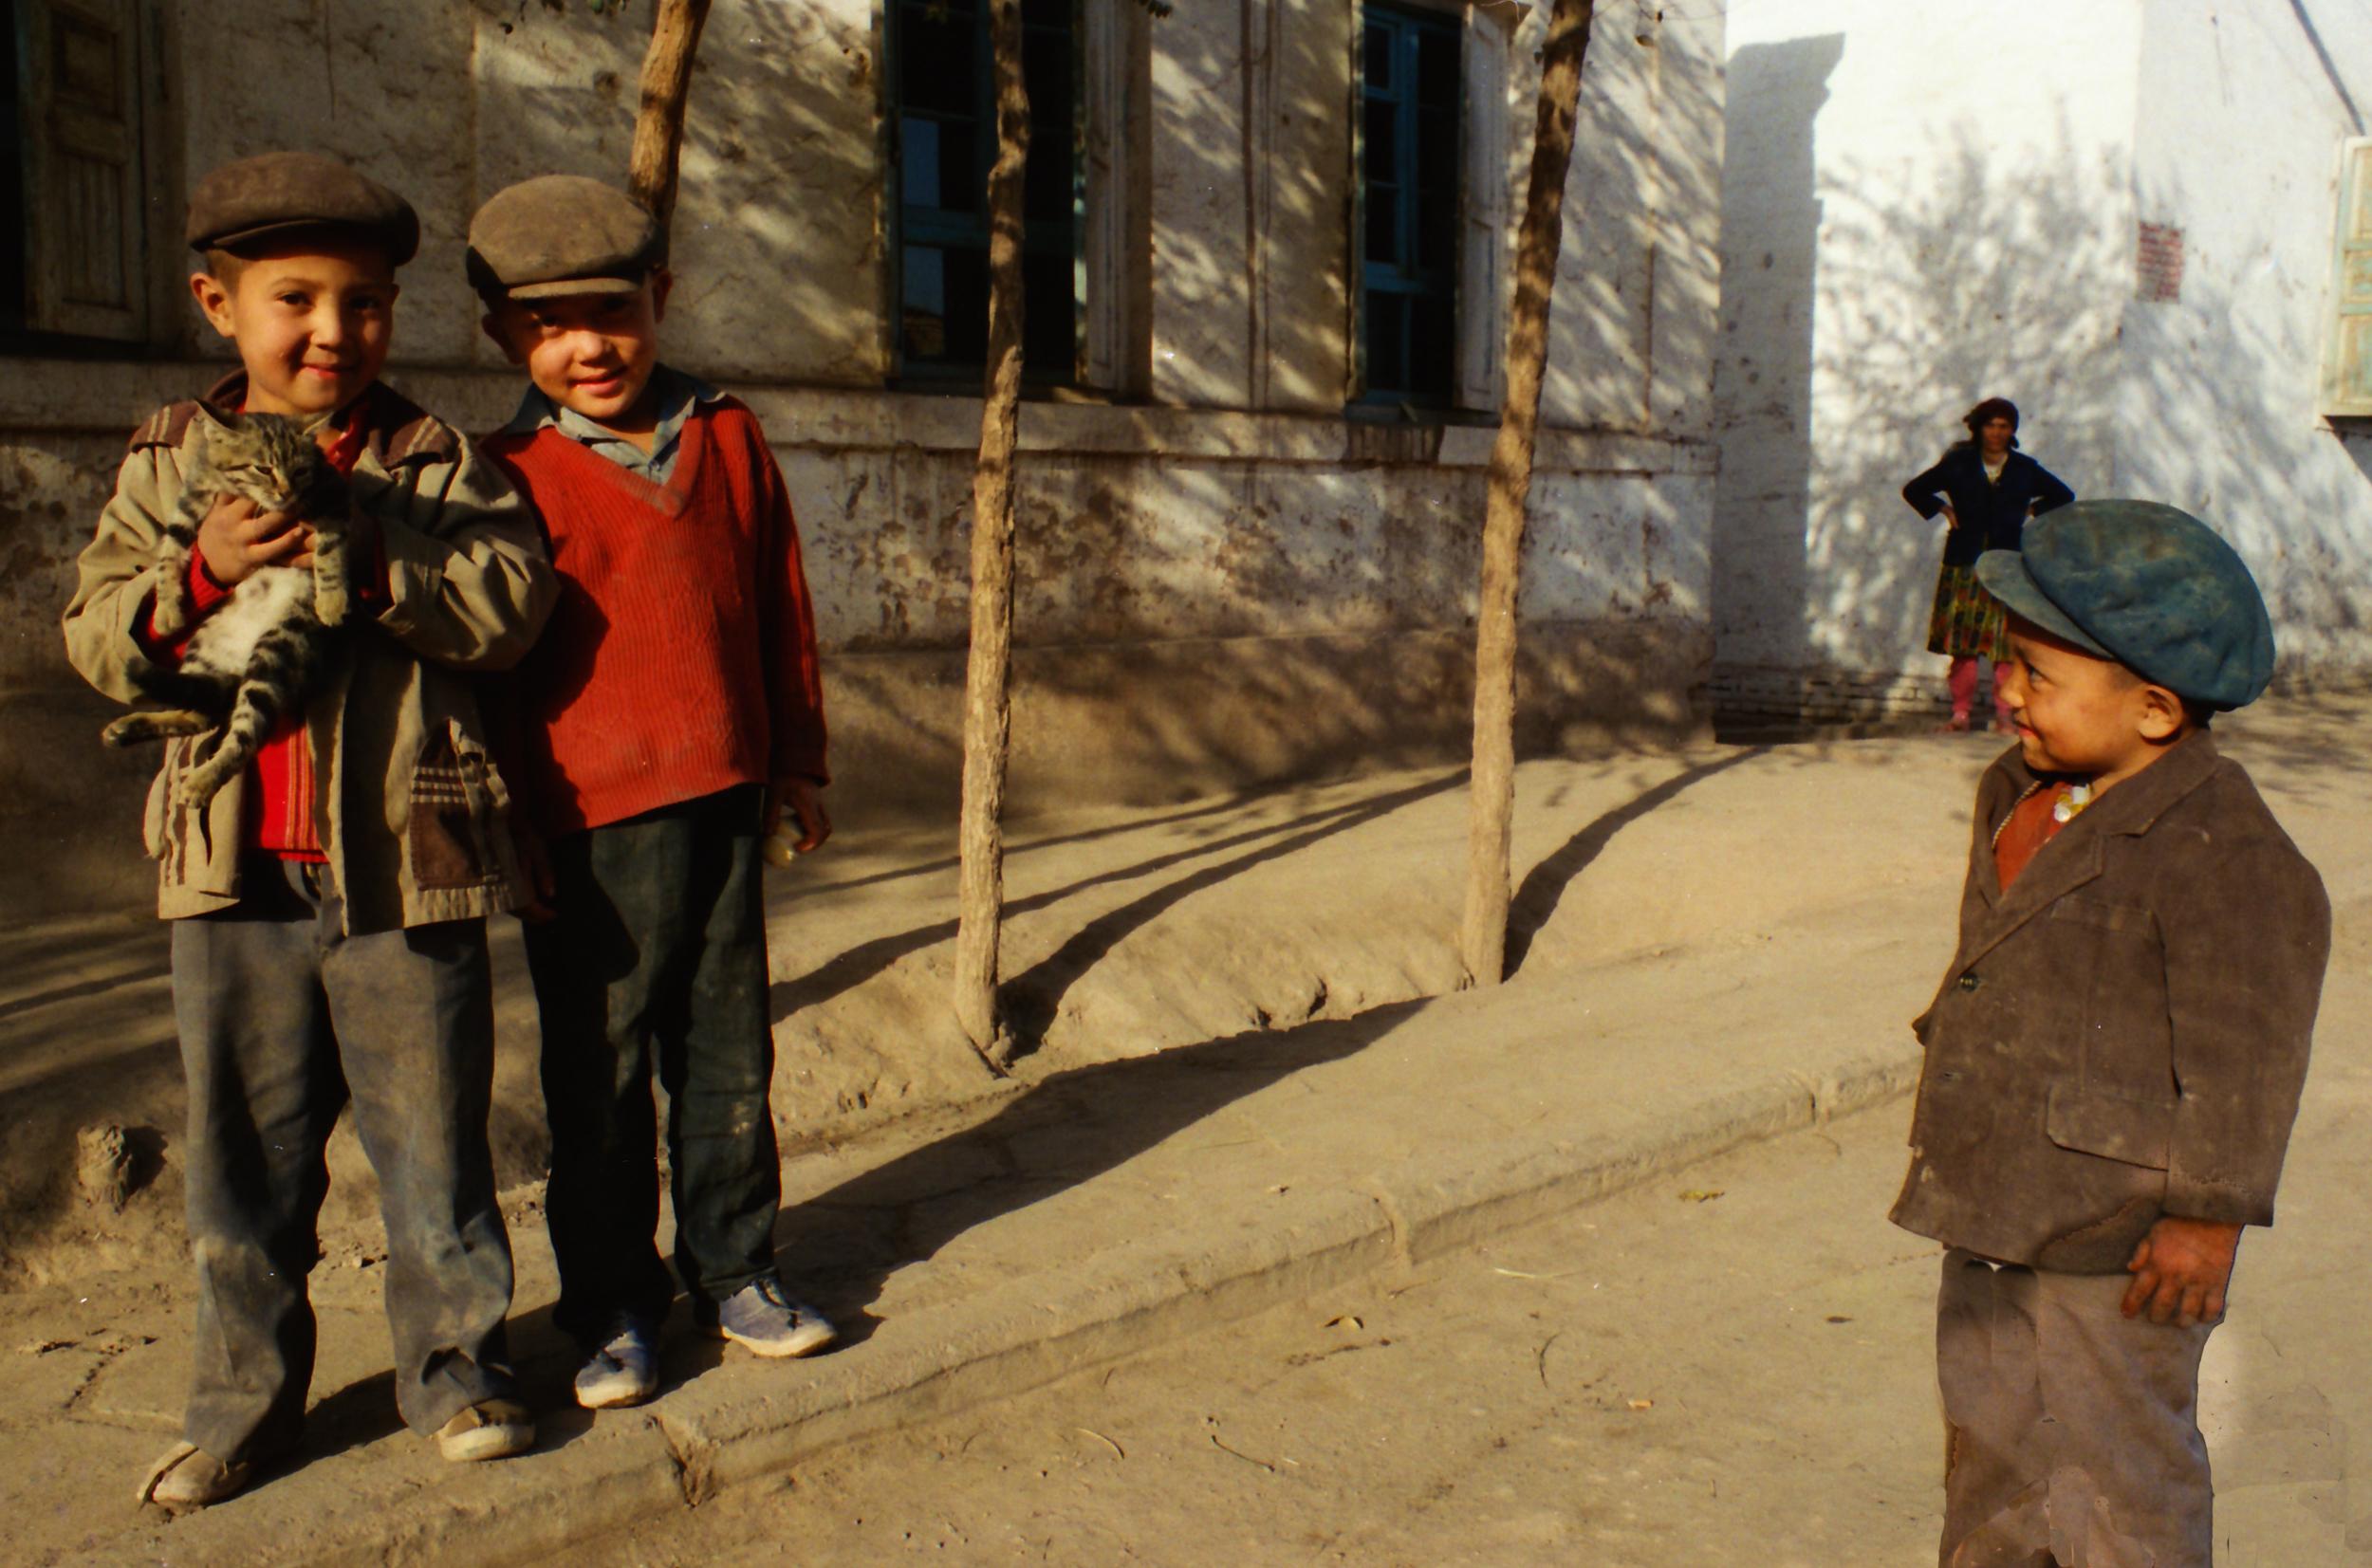 Kids in the backstreets of Kashgar